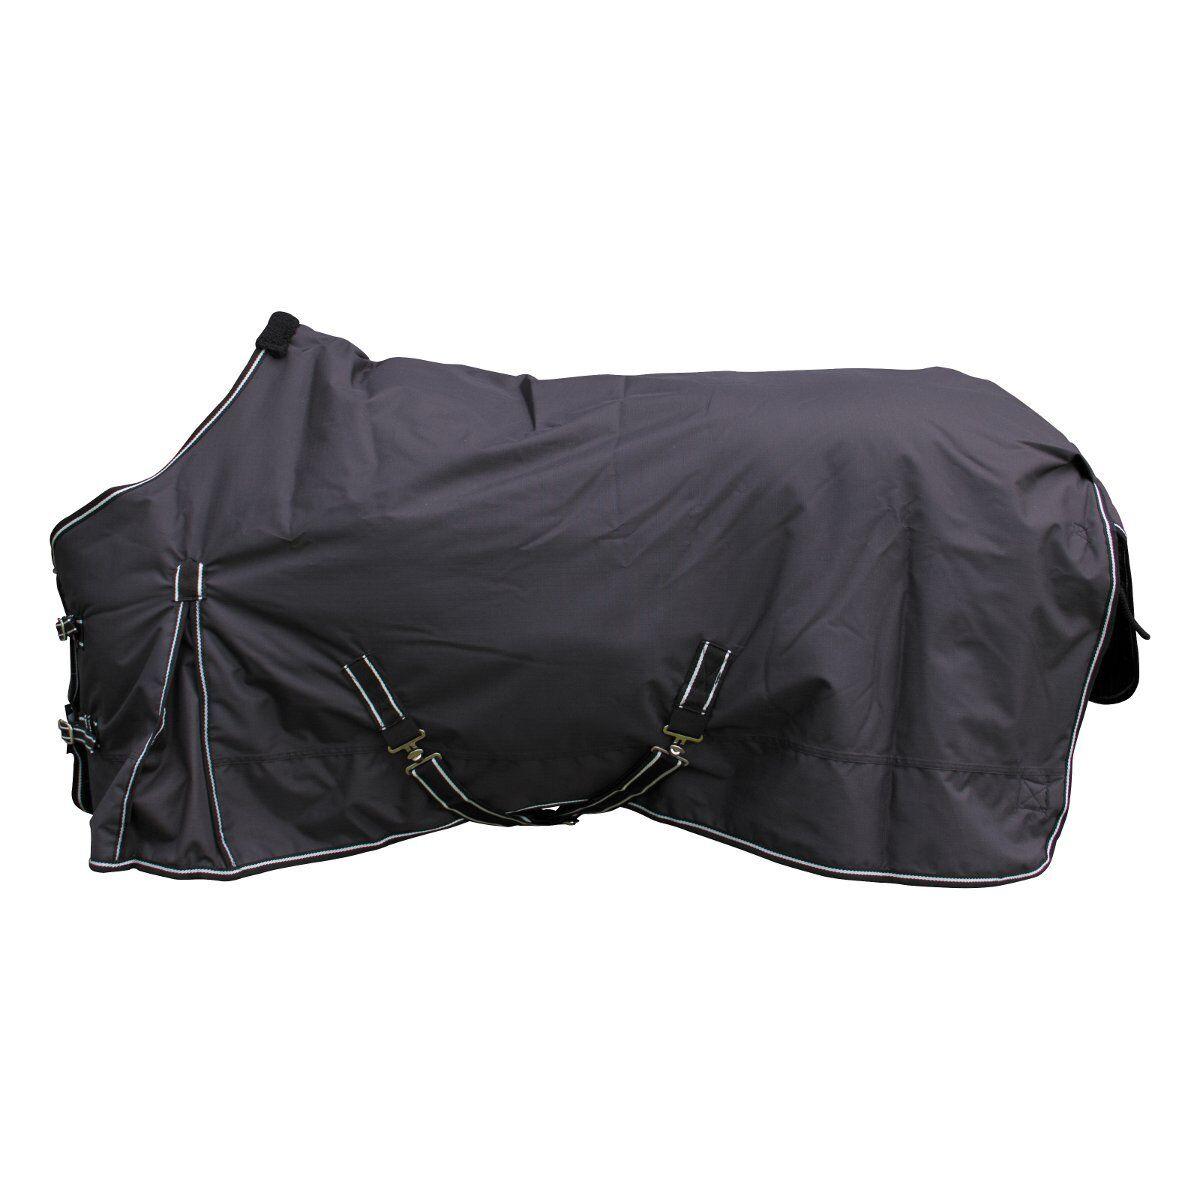 Eldorado Cubierta de Invierno para Caballos, 300G - Negro - 165 cm Manta Caballo